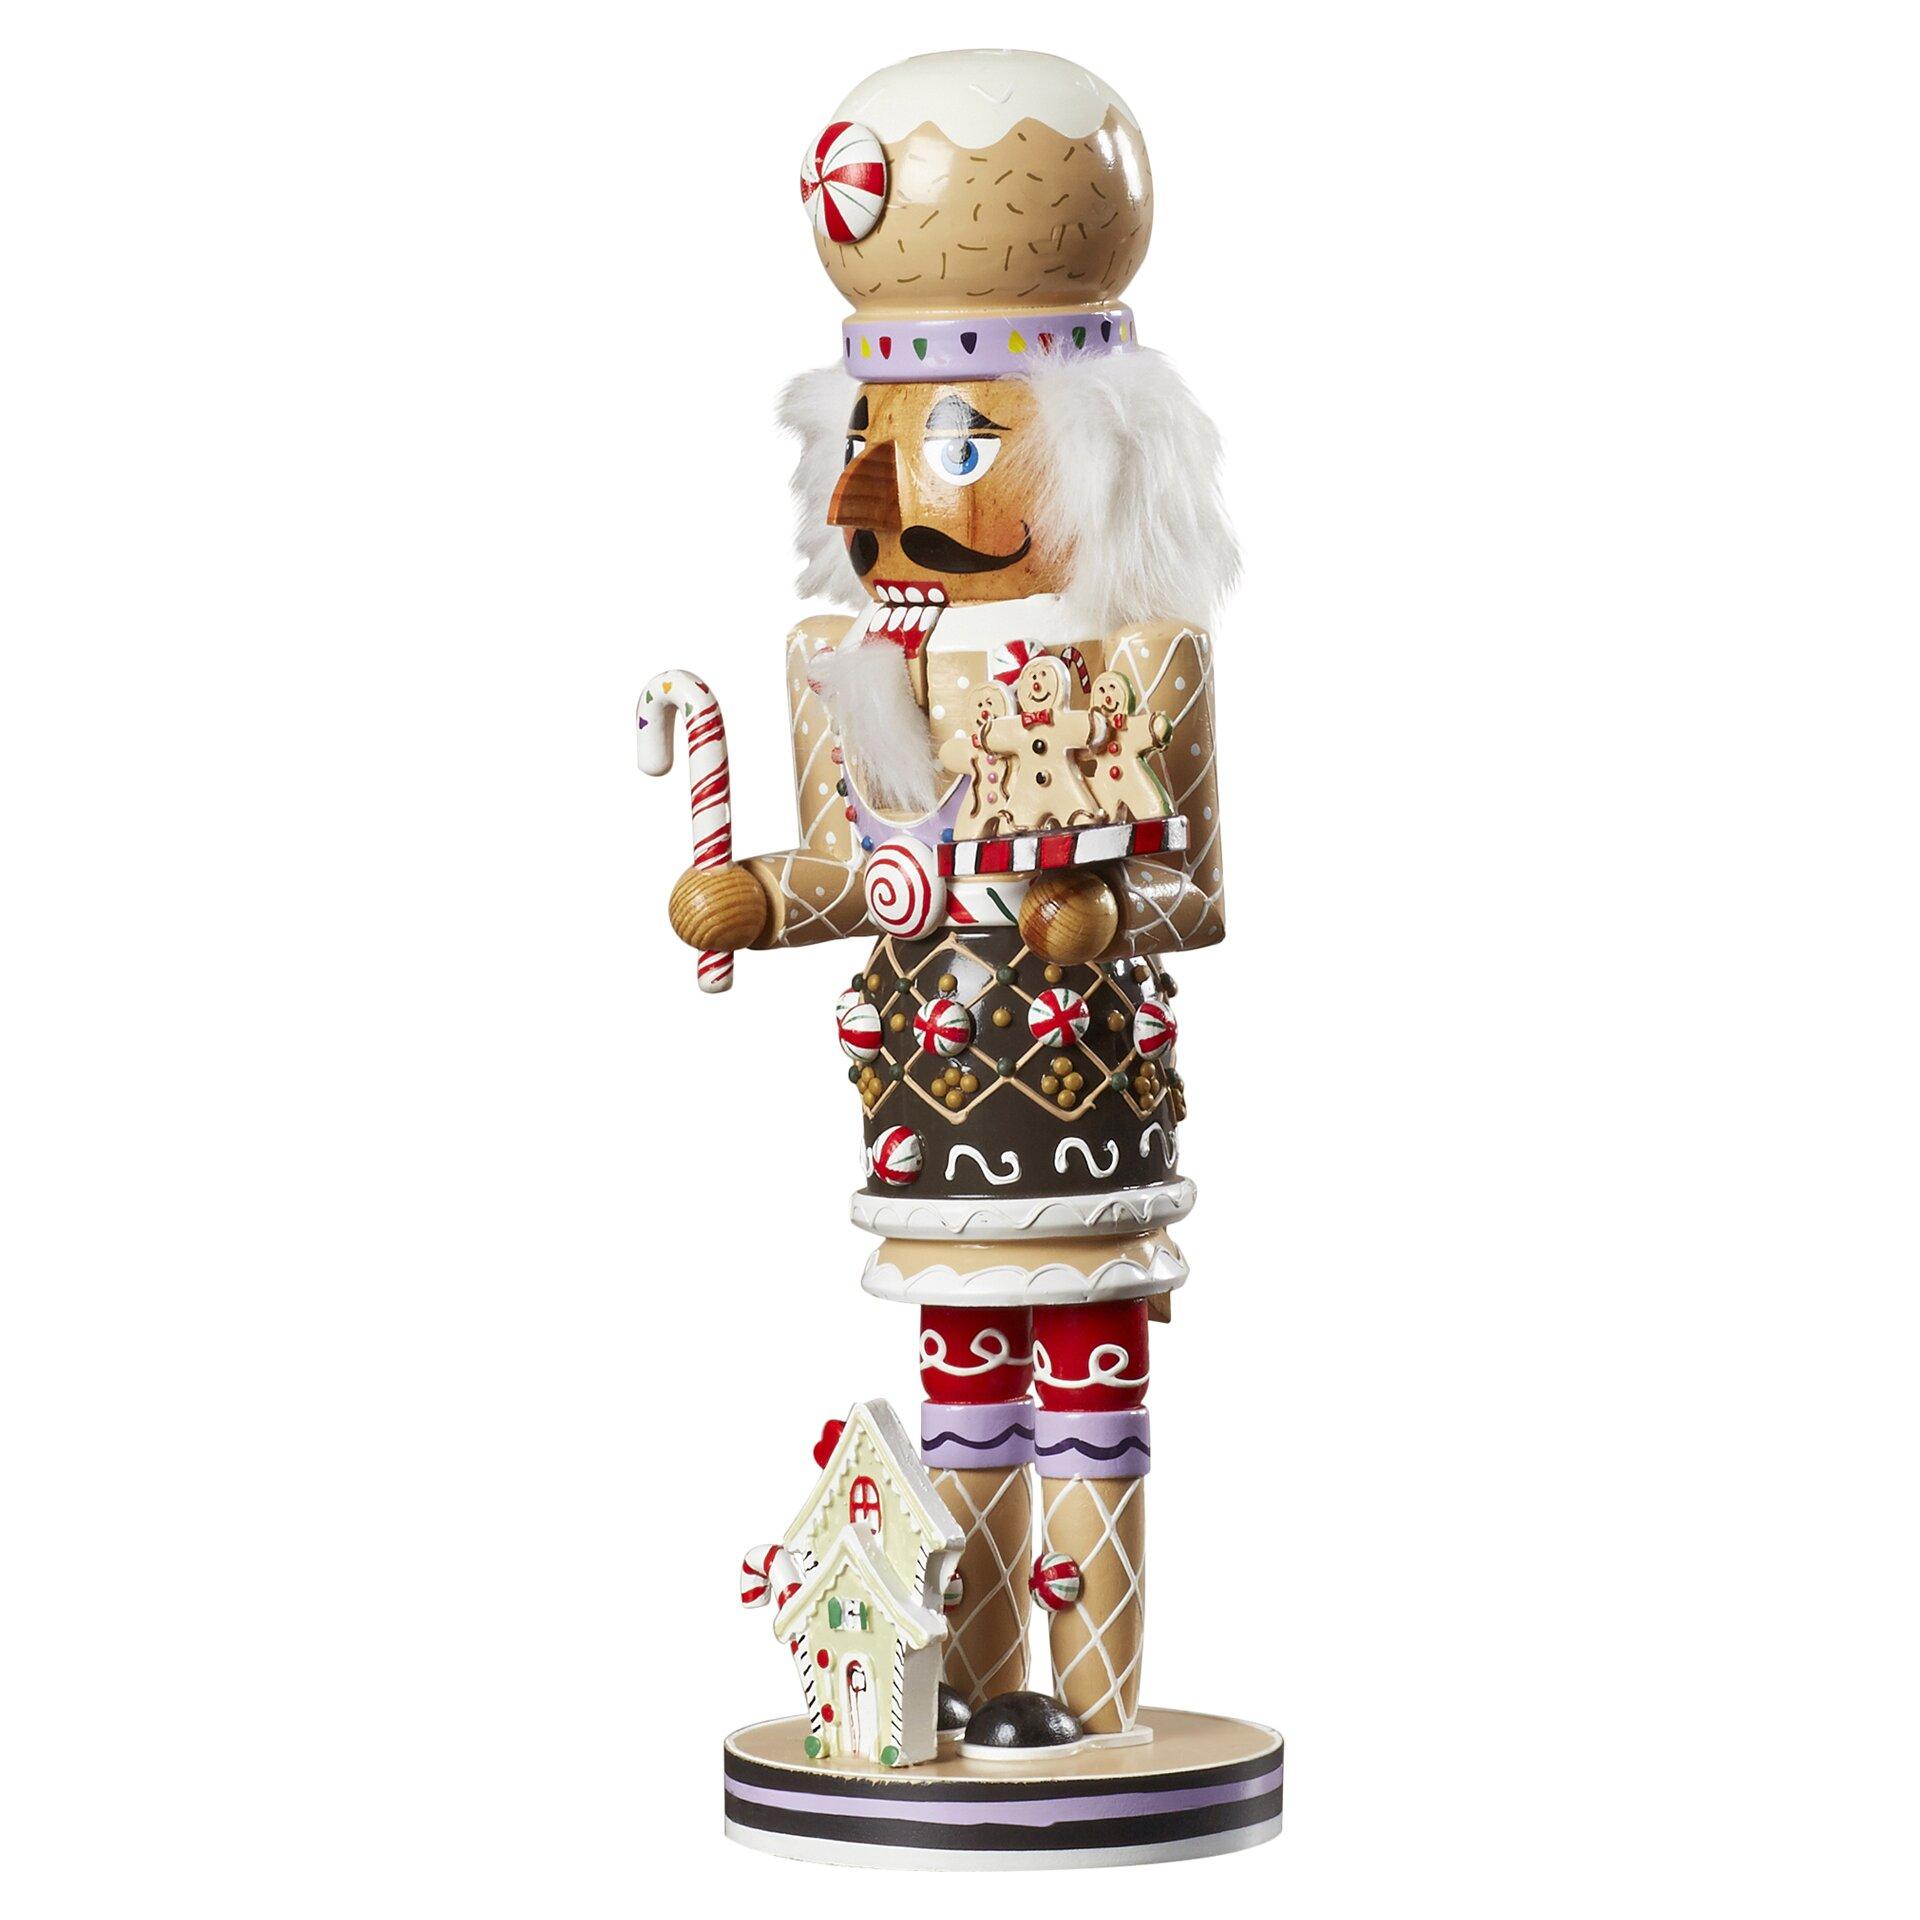 Gingerbread Kitchen Curtains The Holiday Aisle 16 Gingerbread Nutcracker Reviews Wayfair